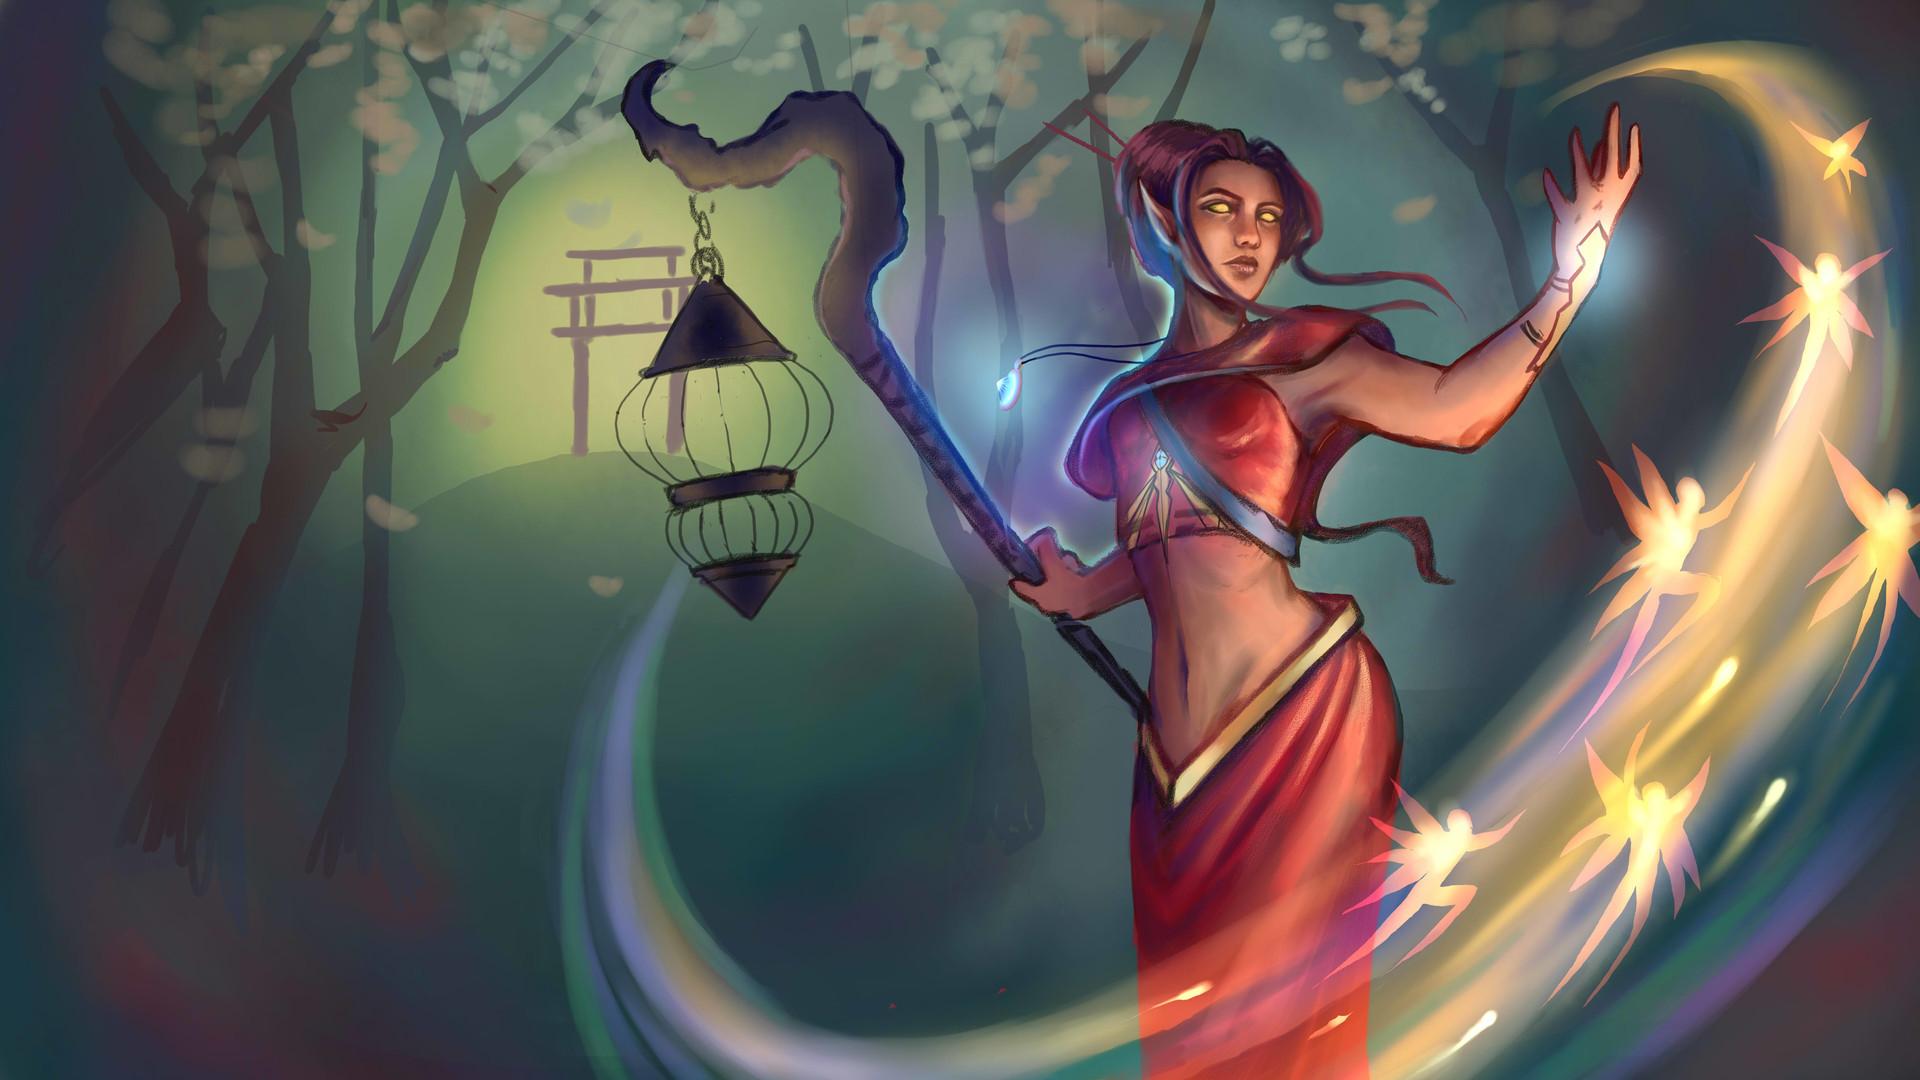 Barbara lucas firefly splash style3